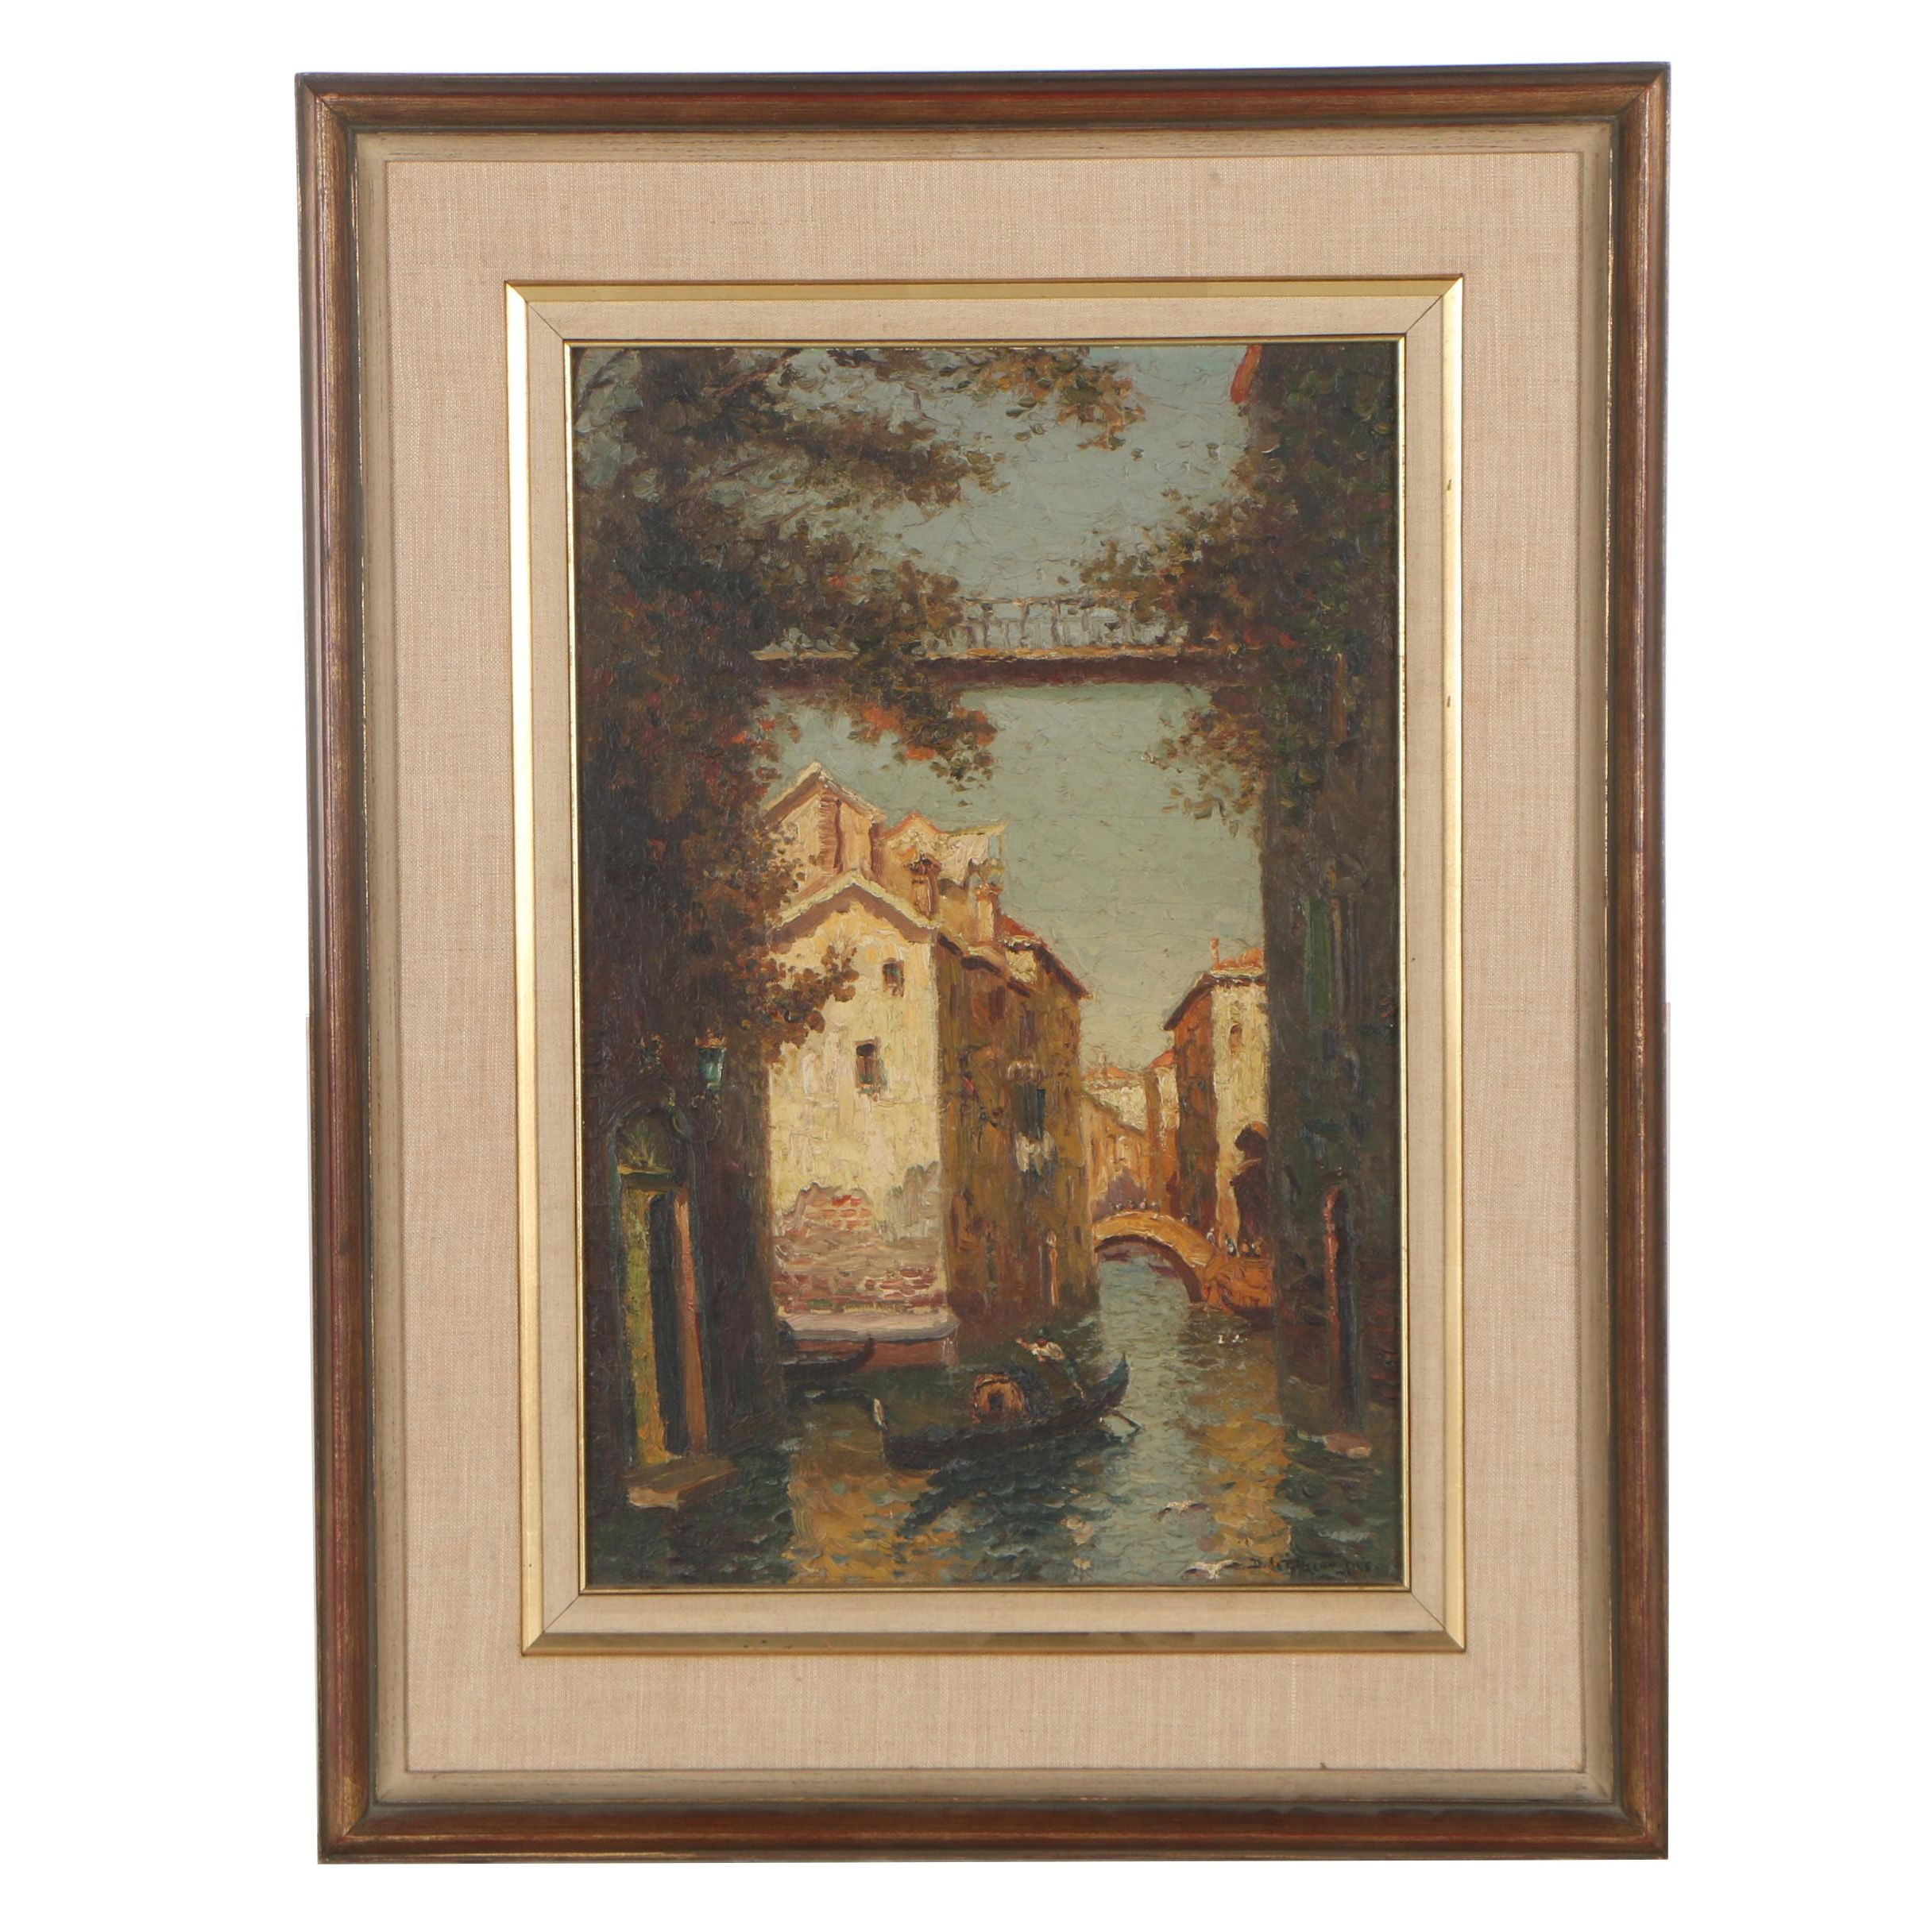 Richard Dey De Ribcowsky Oil Painting